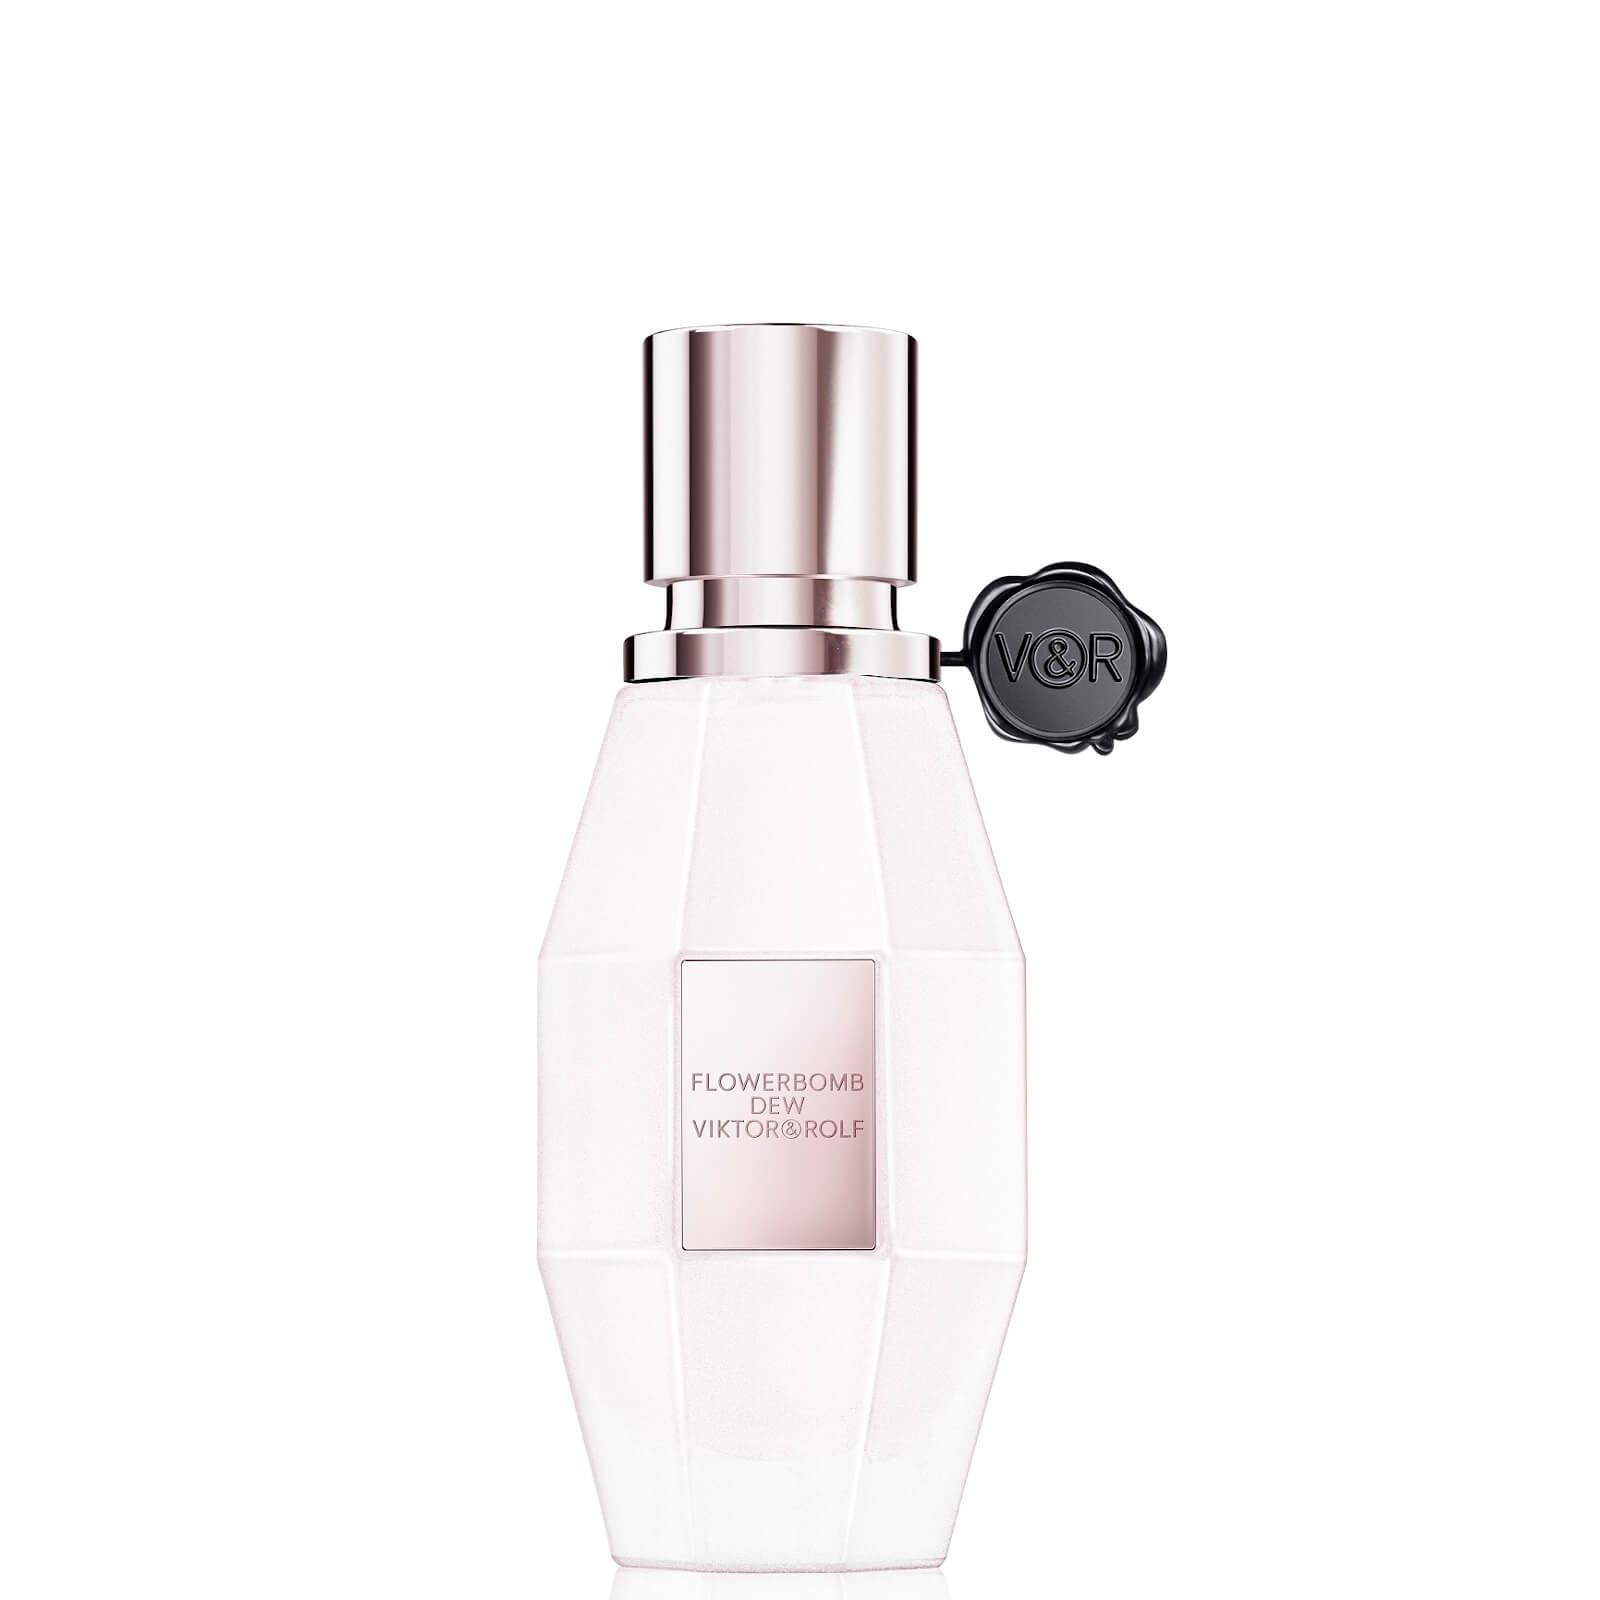 Viktor & Rolf Flowerbomb Dew Eau de Parfum (Various Sizes) - 30ml